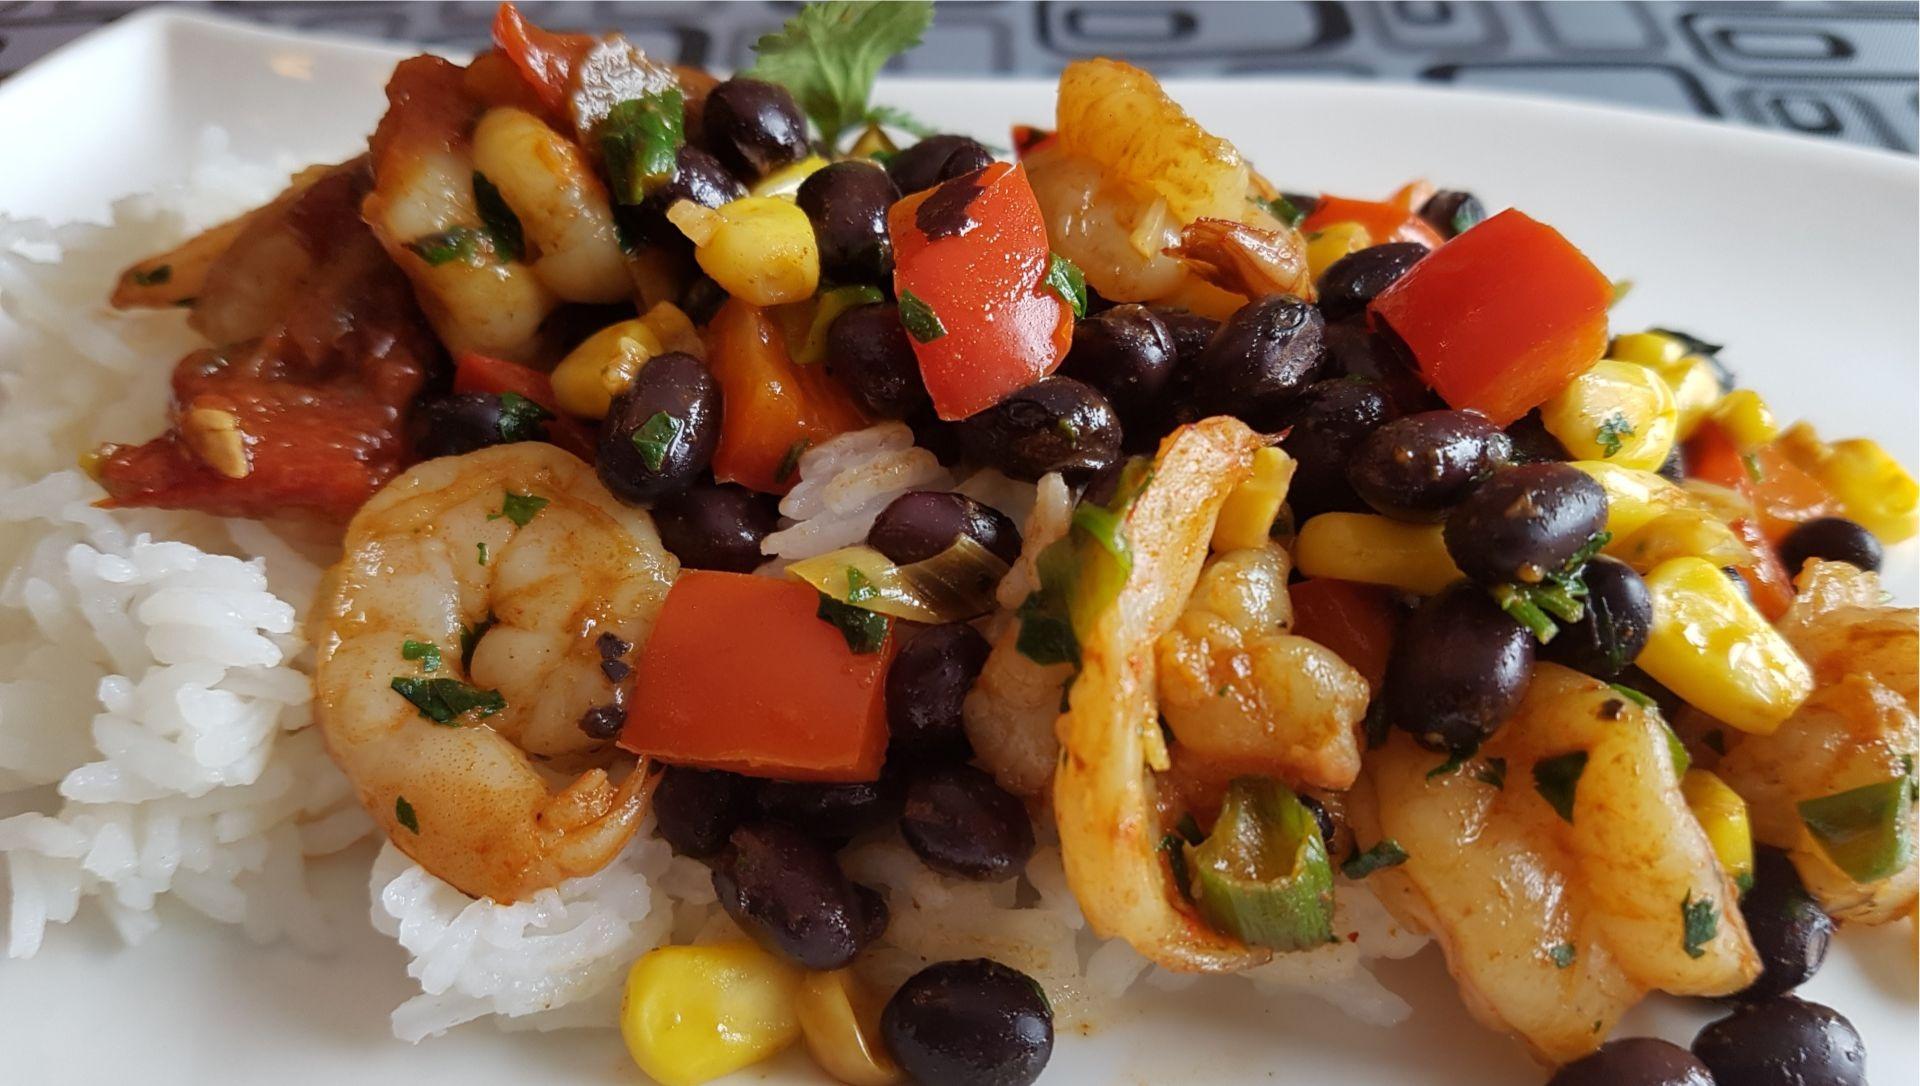 Shrimp, red peppers, black beans, corn, white rice on plate